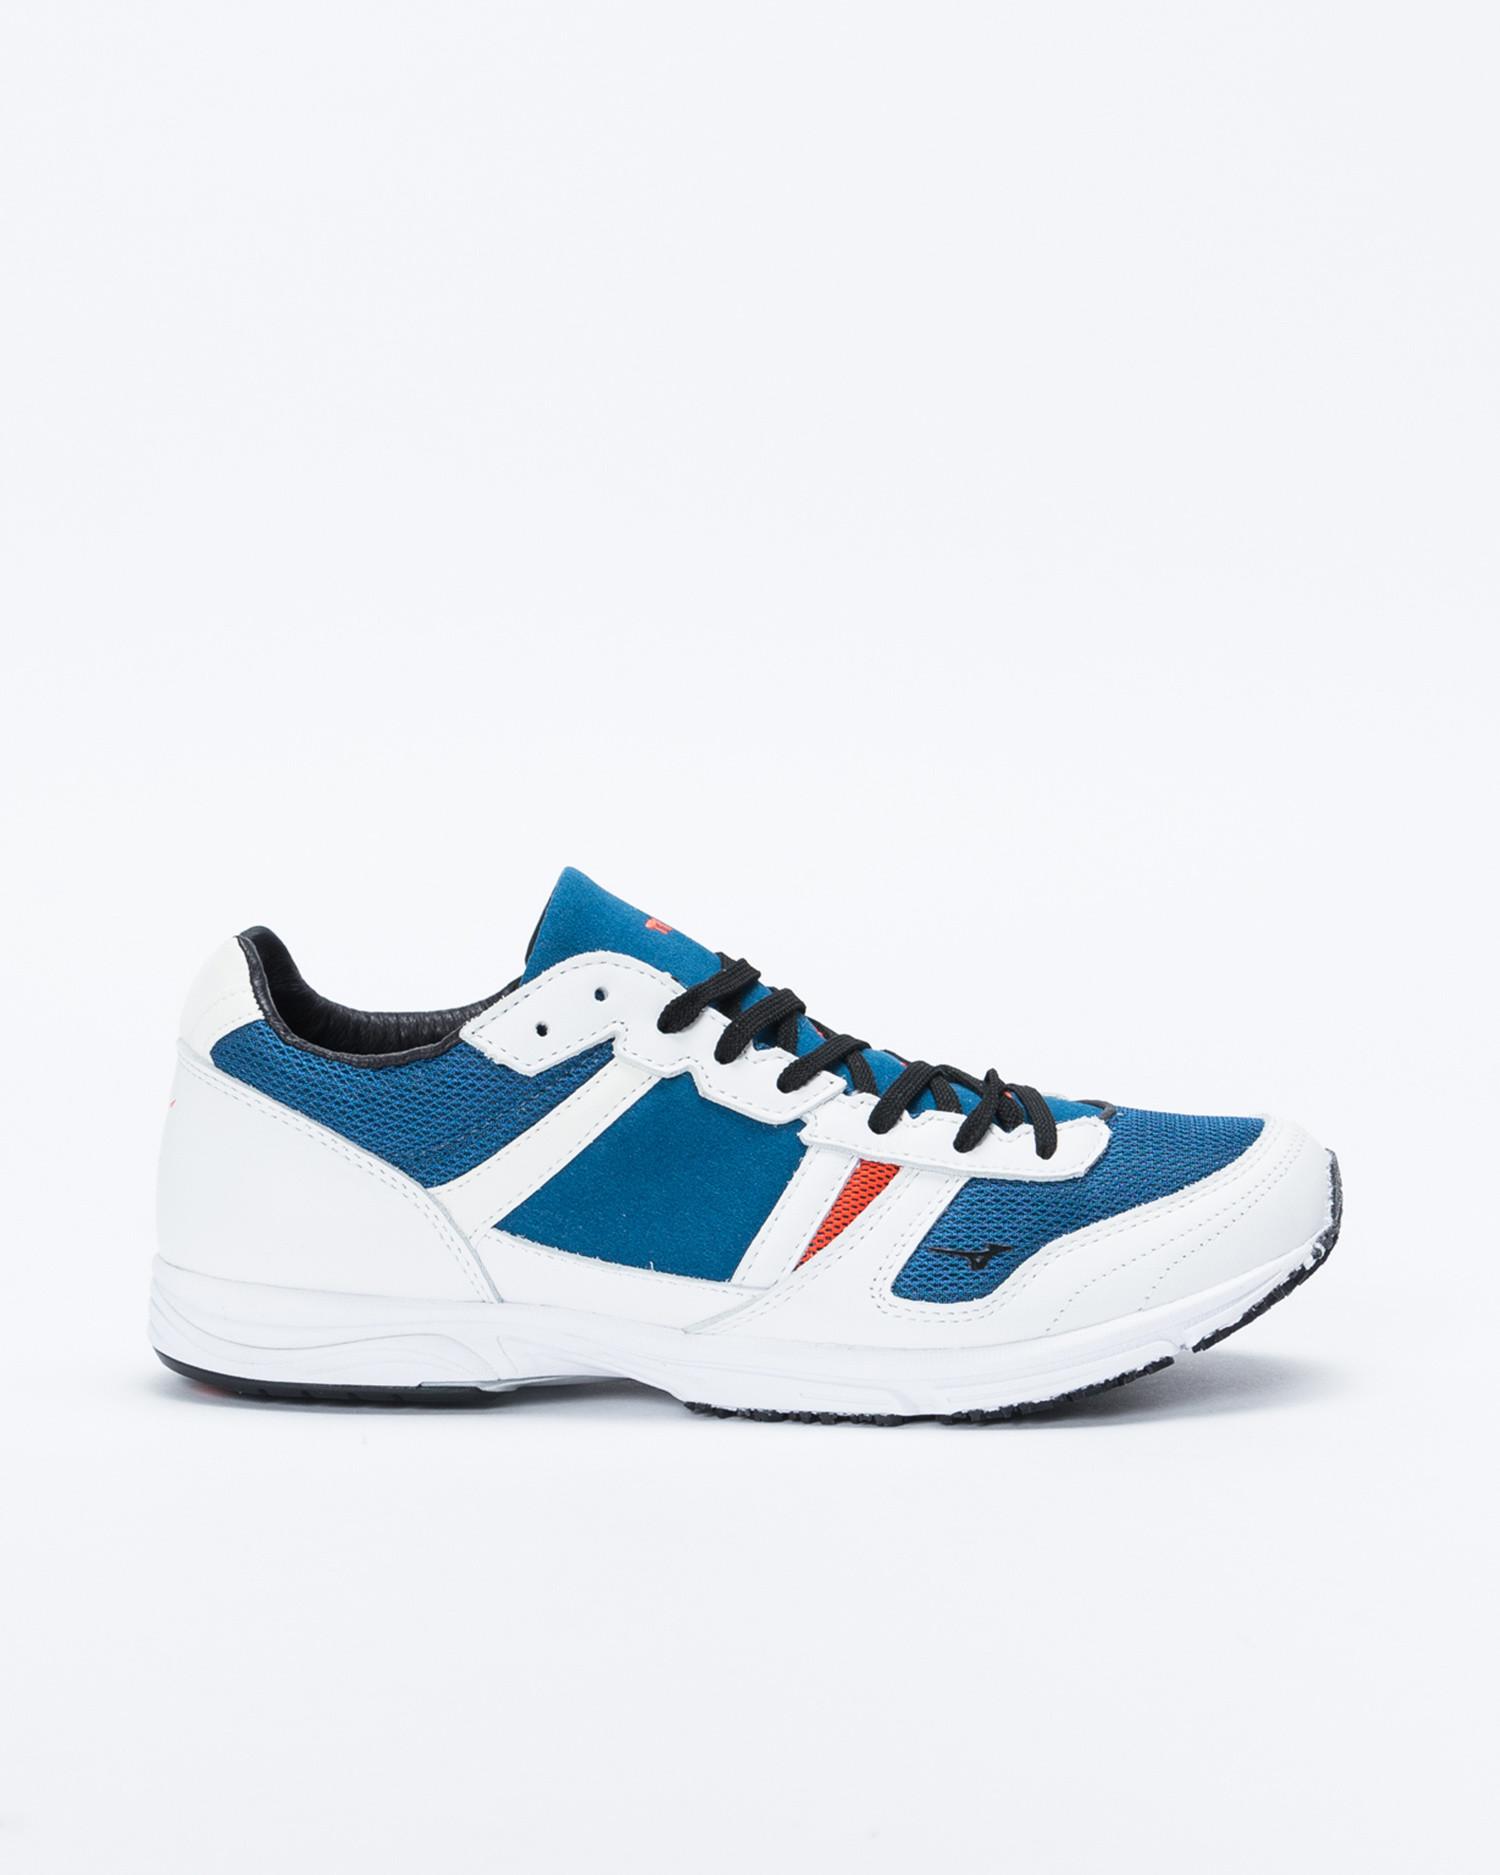 Futur x Mizuno Wave Emperor Olympic Blue